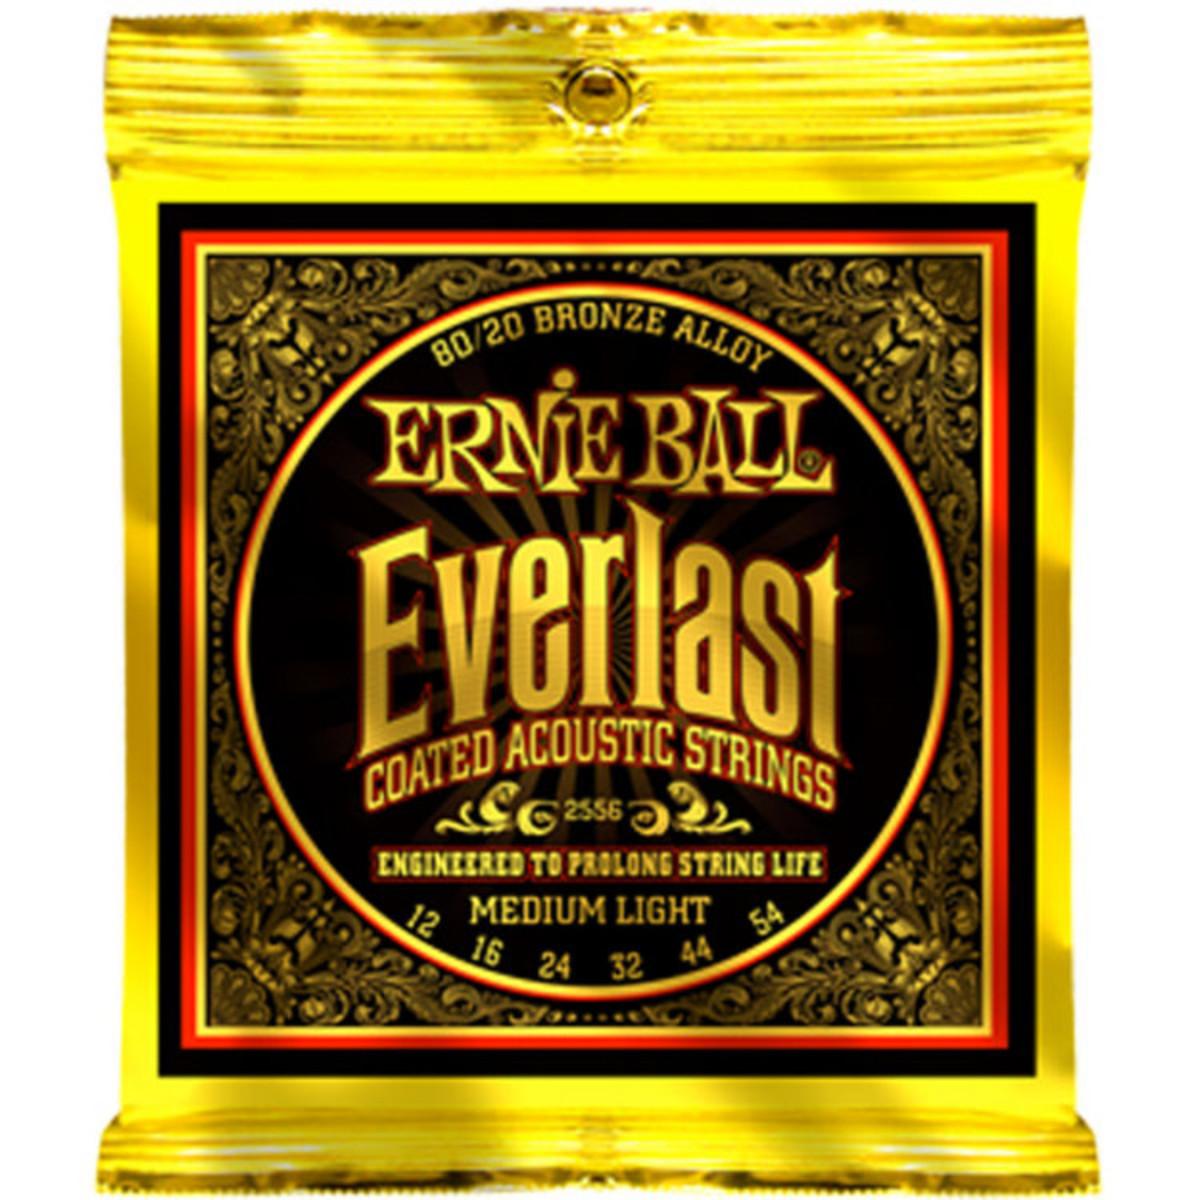 ernie ball everlast 2556 80 20 bronze acoustic guitar strings 12 54 at gear4music. Black Bedroom Furniture Sets. Home Design Ideas